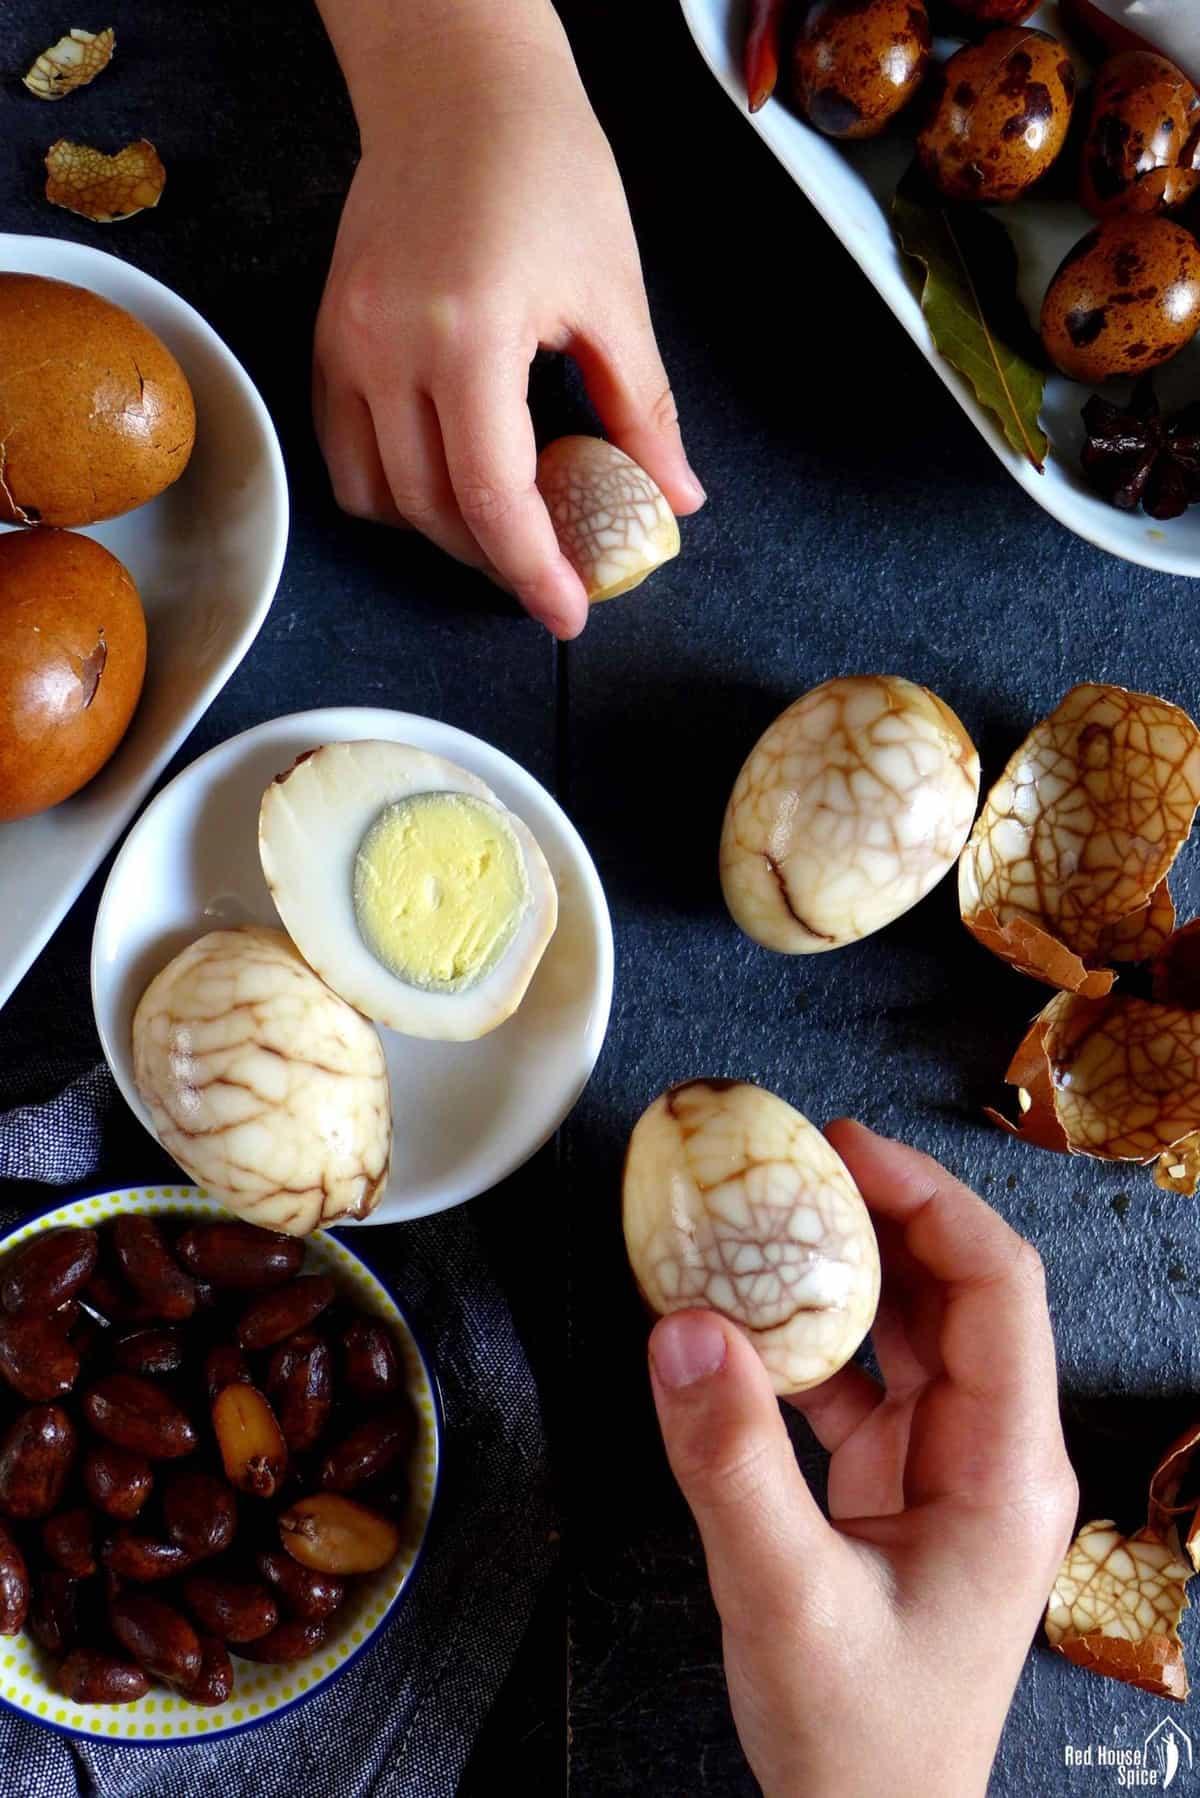 Marbled tea eggs held in two hands